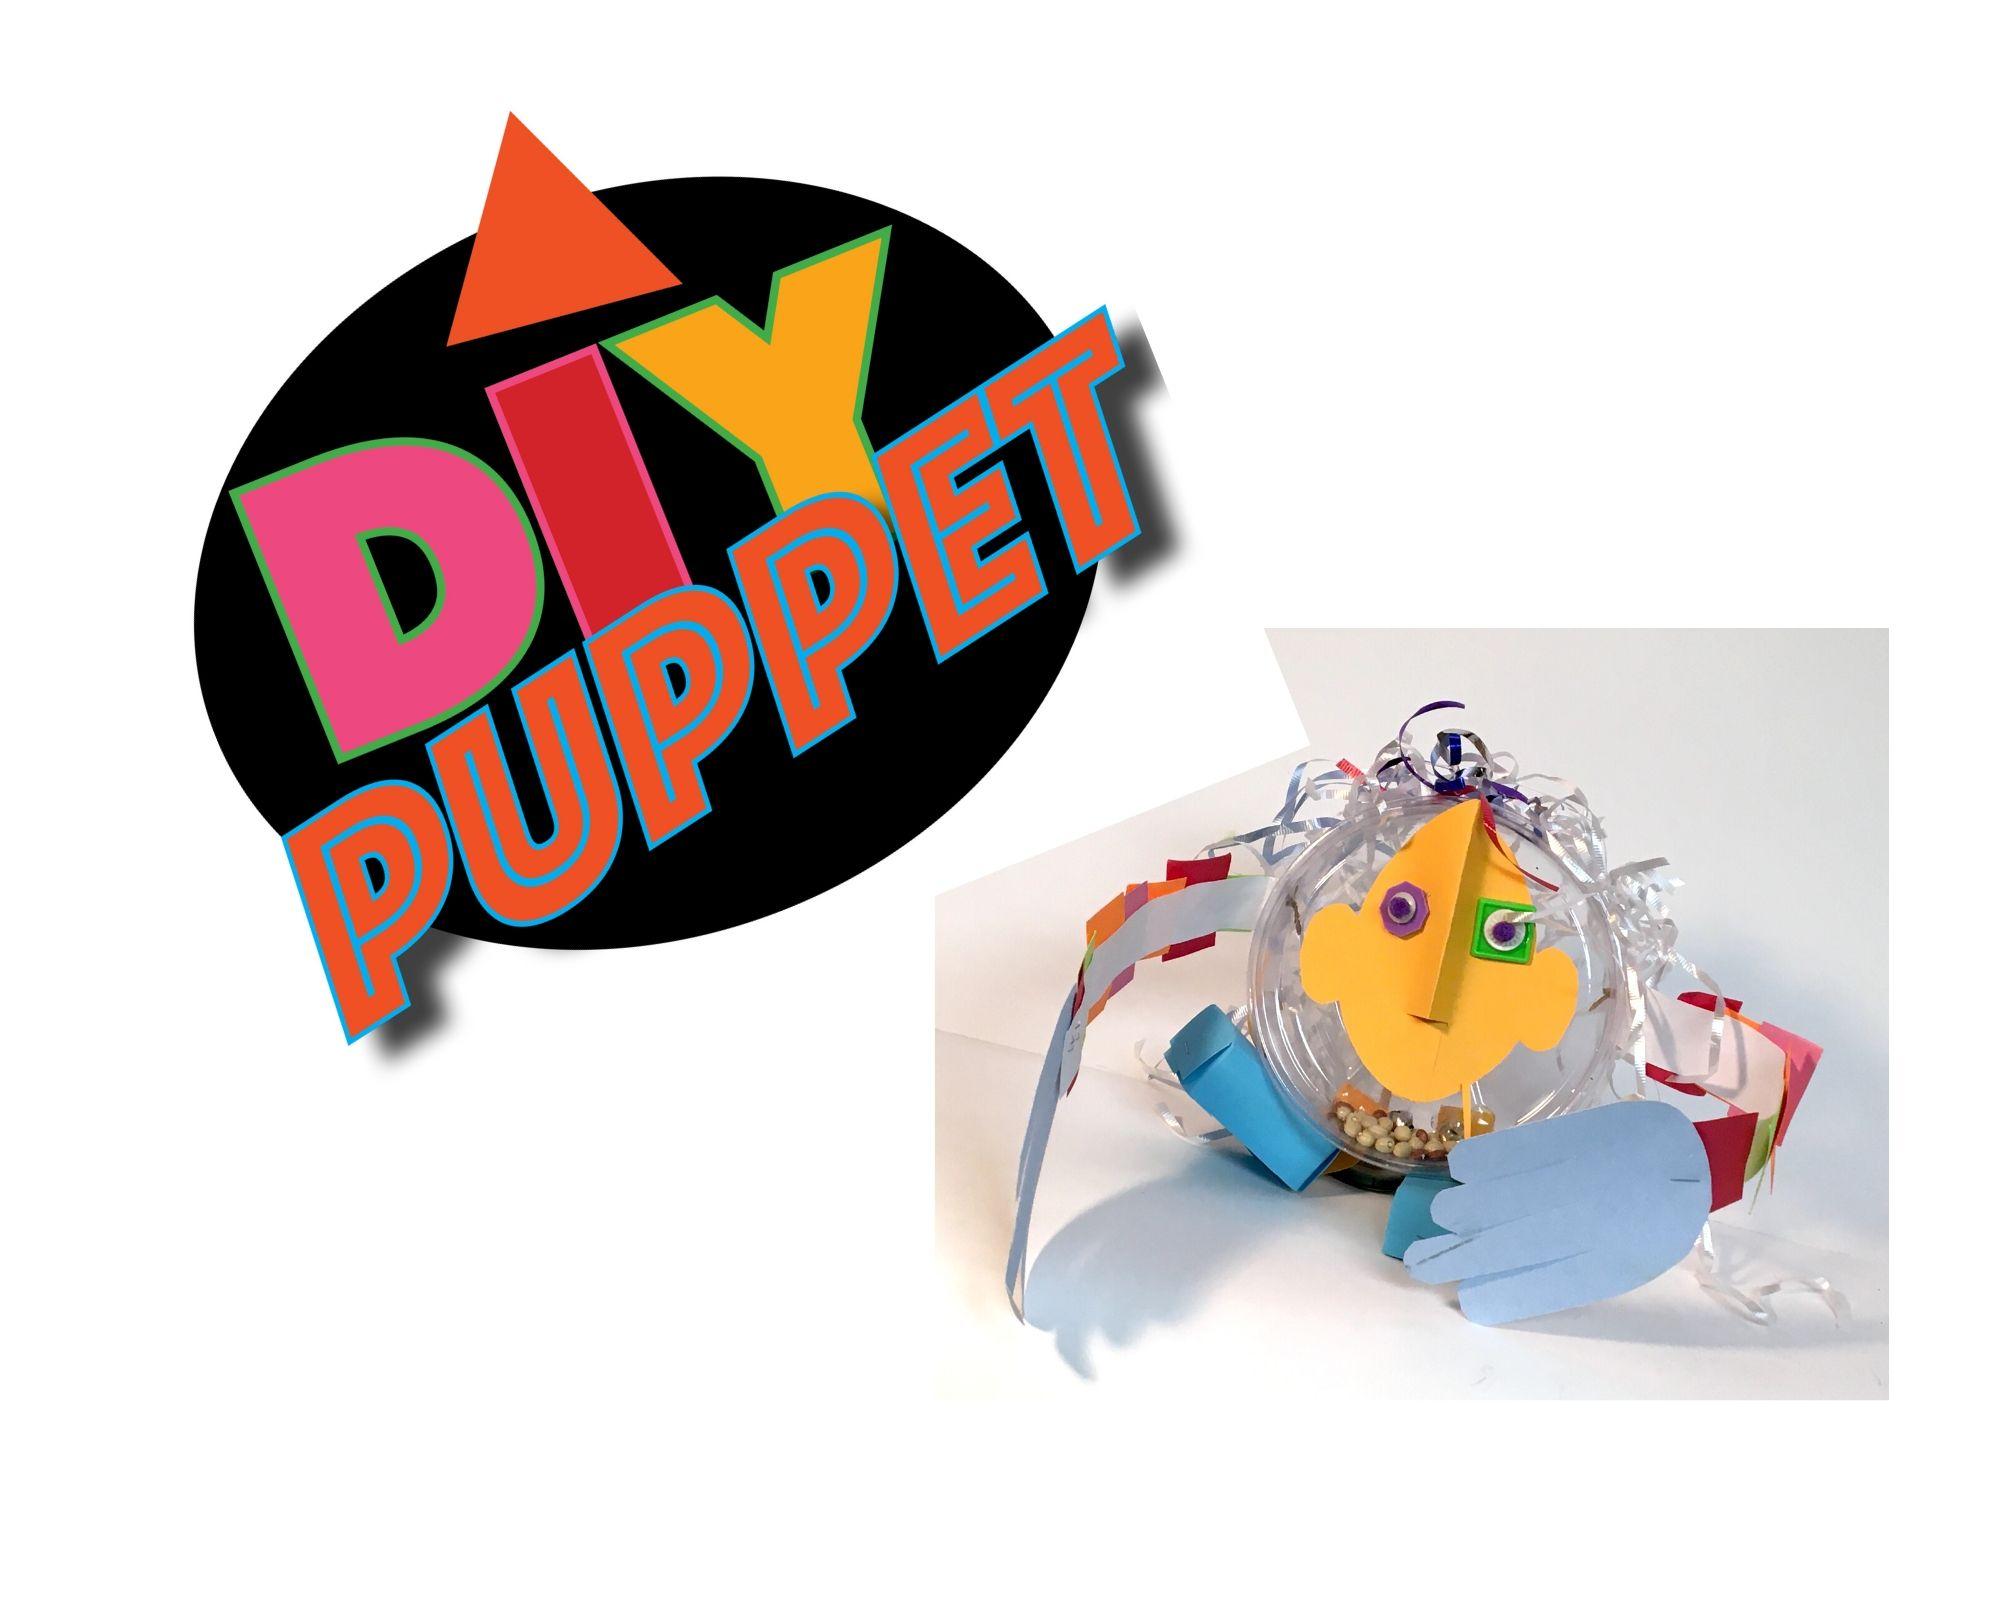 DIY Tintamarre puppet